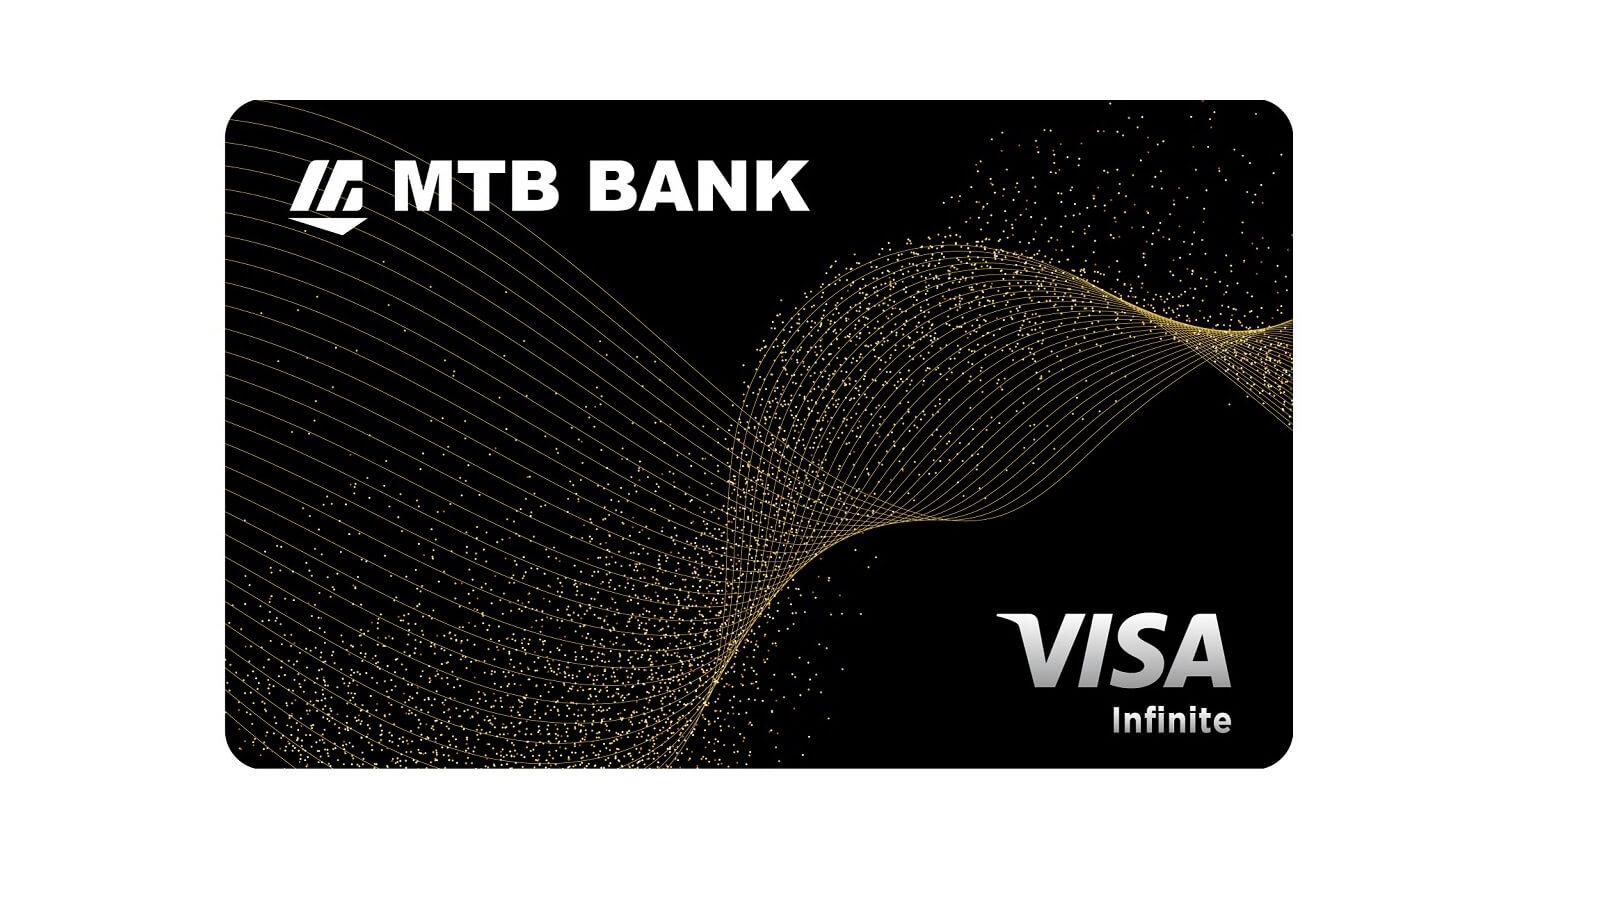 Картка Visa Infinite від МТБ БАНК  - фото - mtb.ua